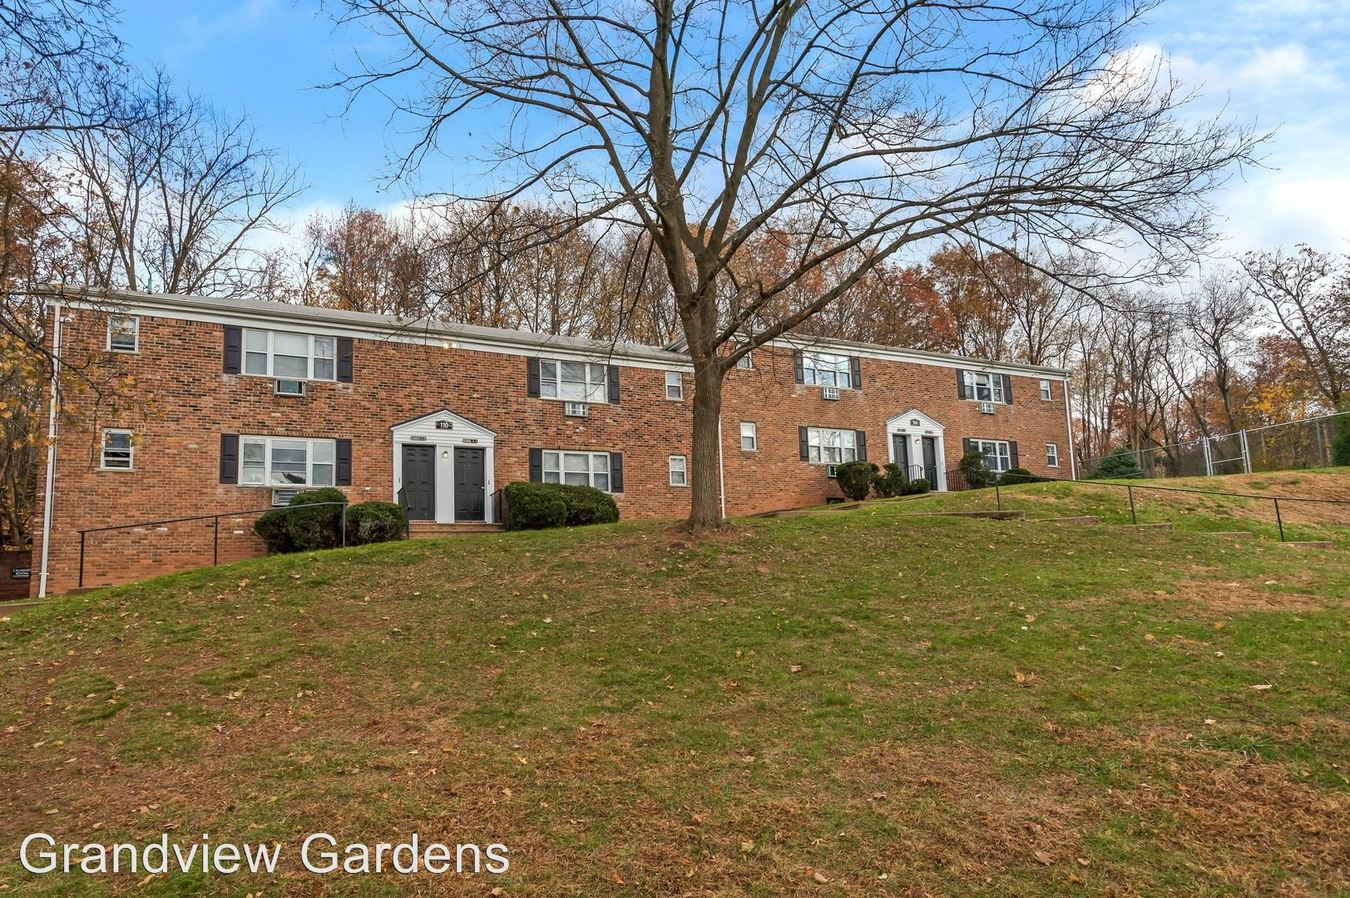 145 A Grandview Ave Edison, NJ Apartment for Rent